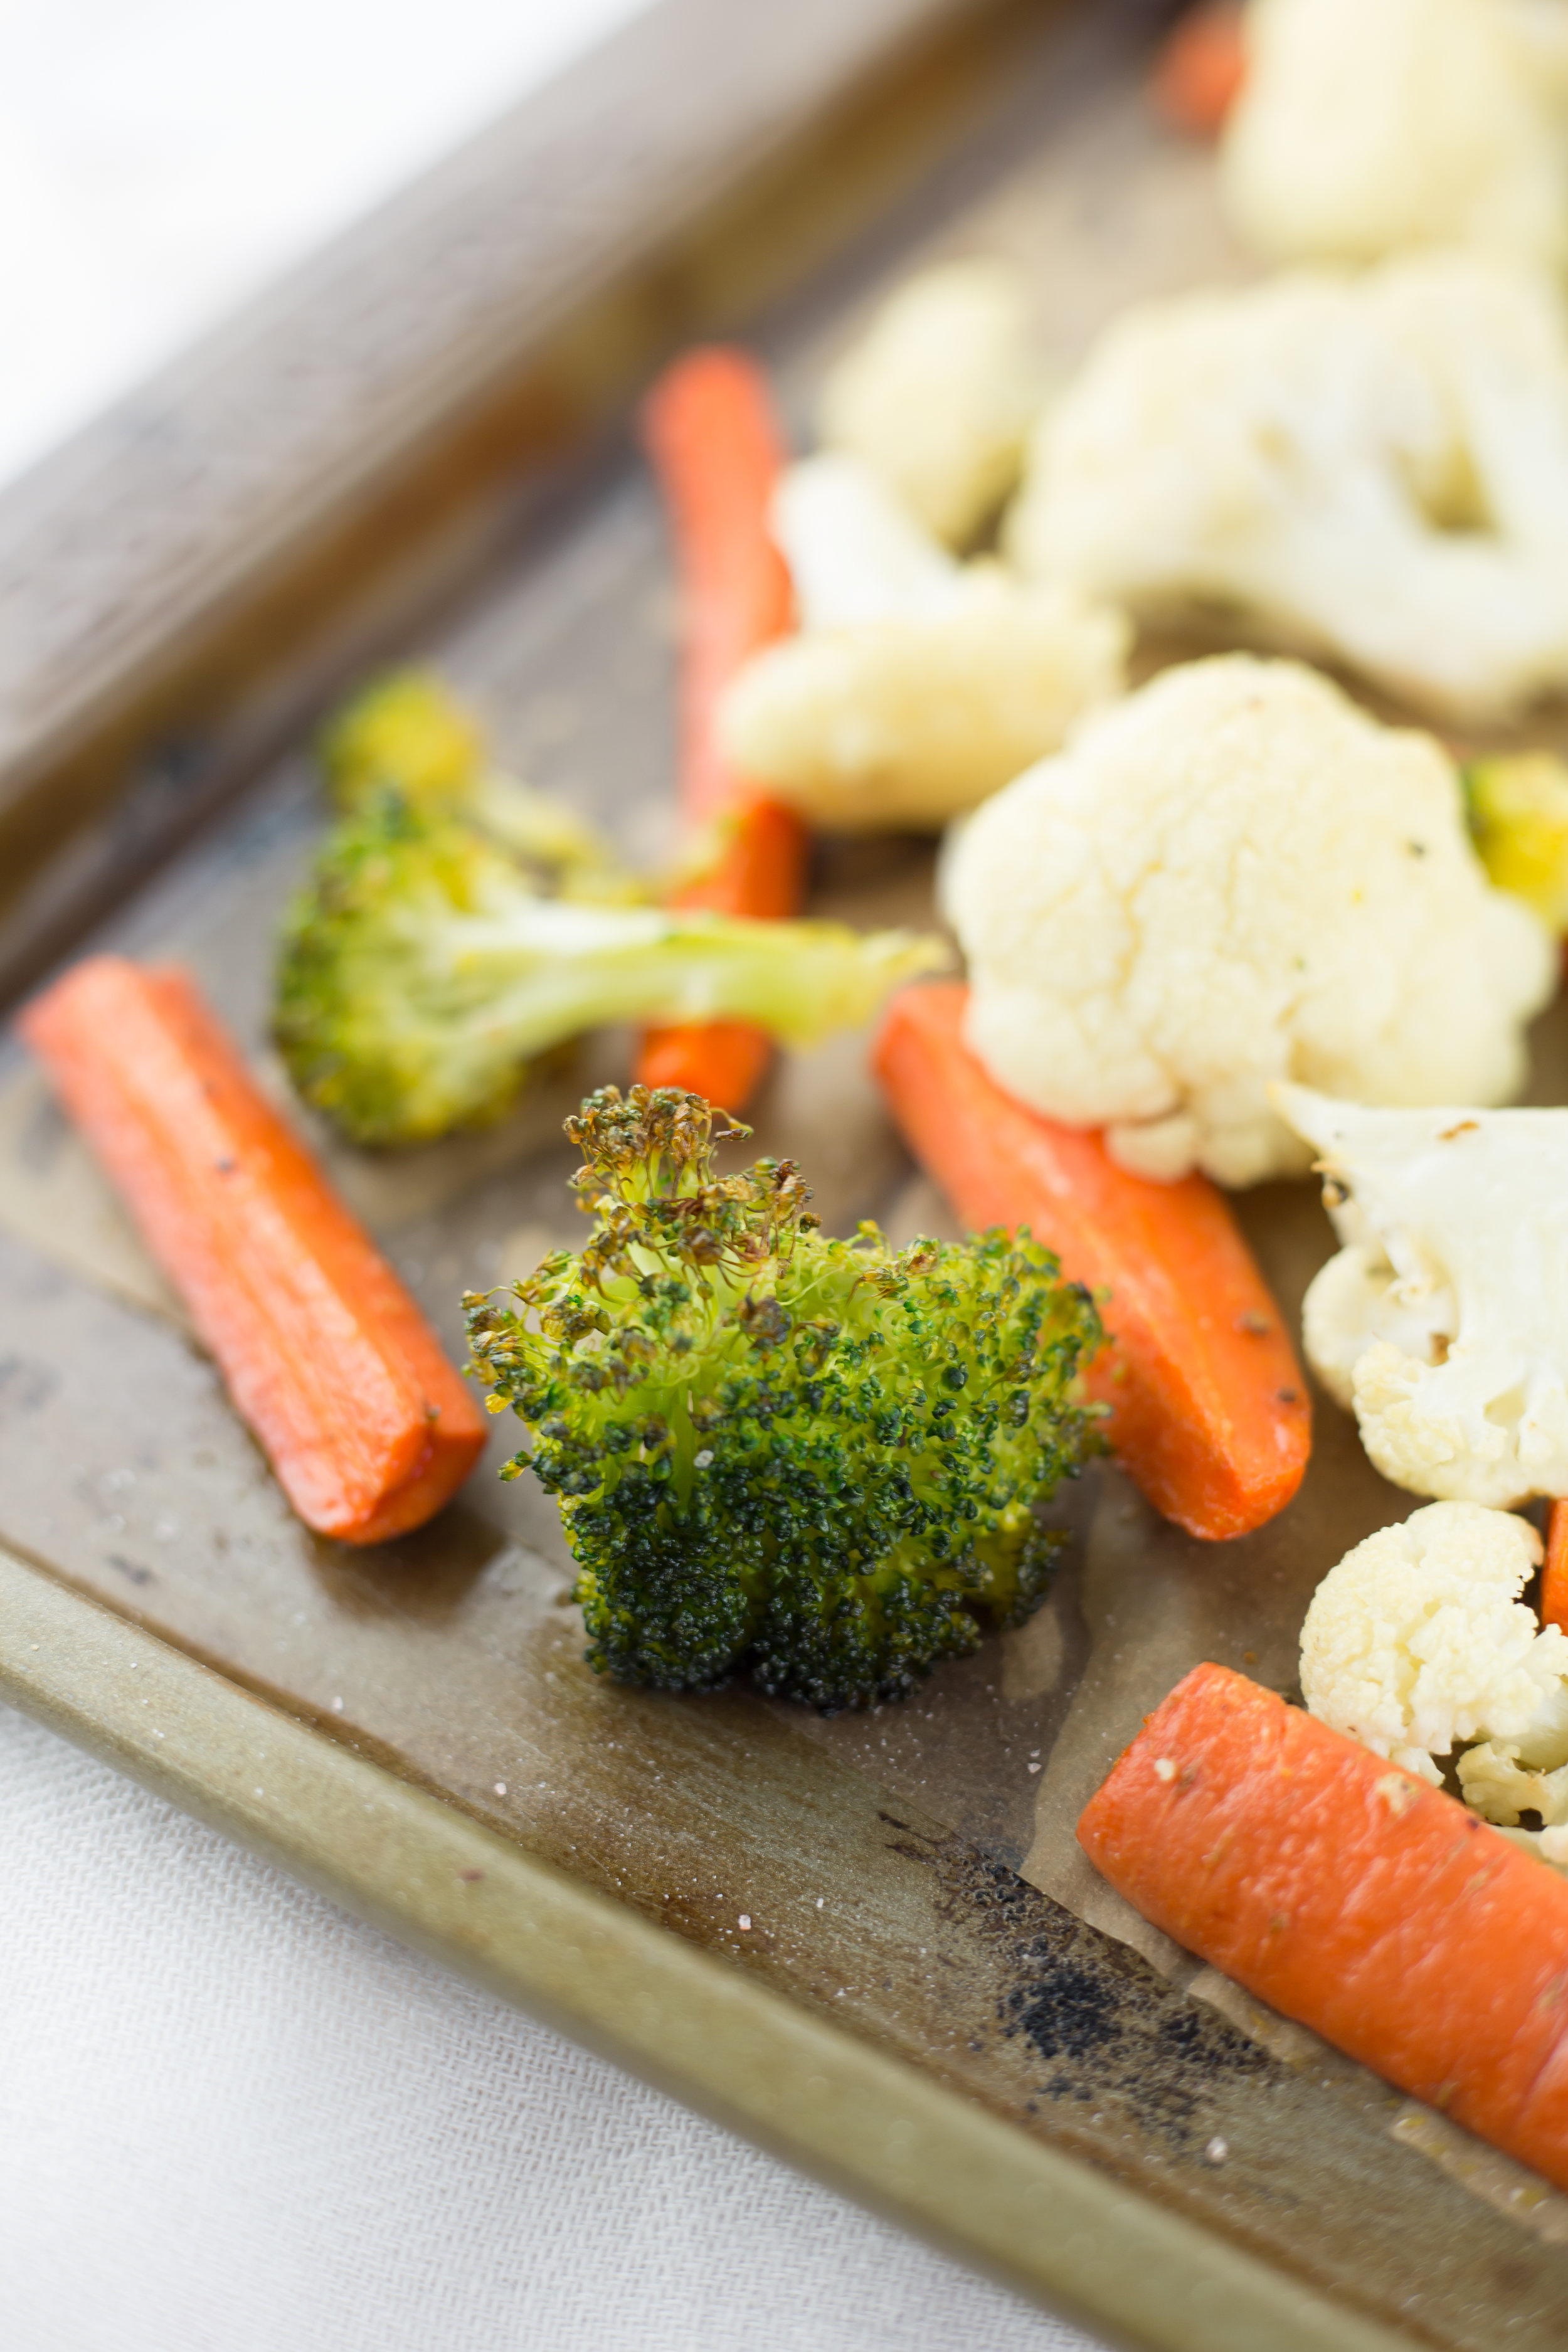 Paleo Side Dishes, Paleo Foods, Paleo Blogger, Healthy Recipes, Real Food, Preservative Free, No Sugar, Sugar Detox